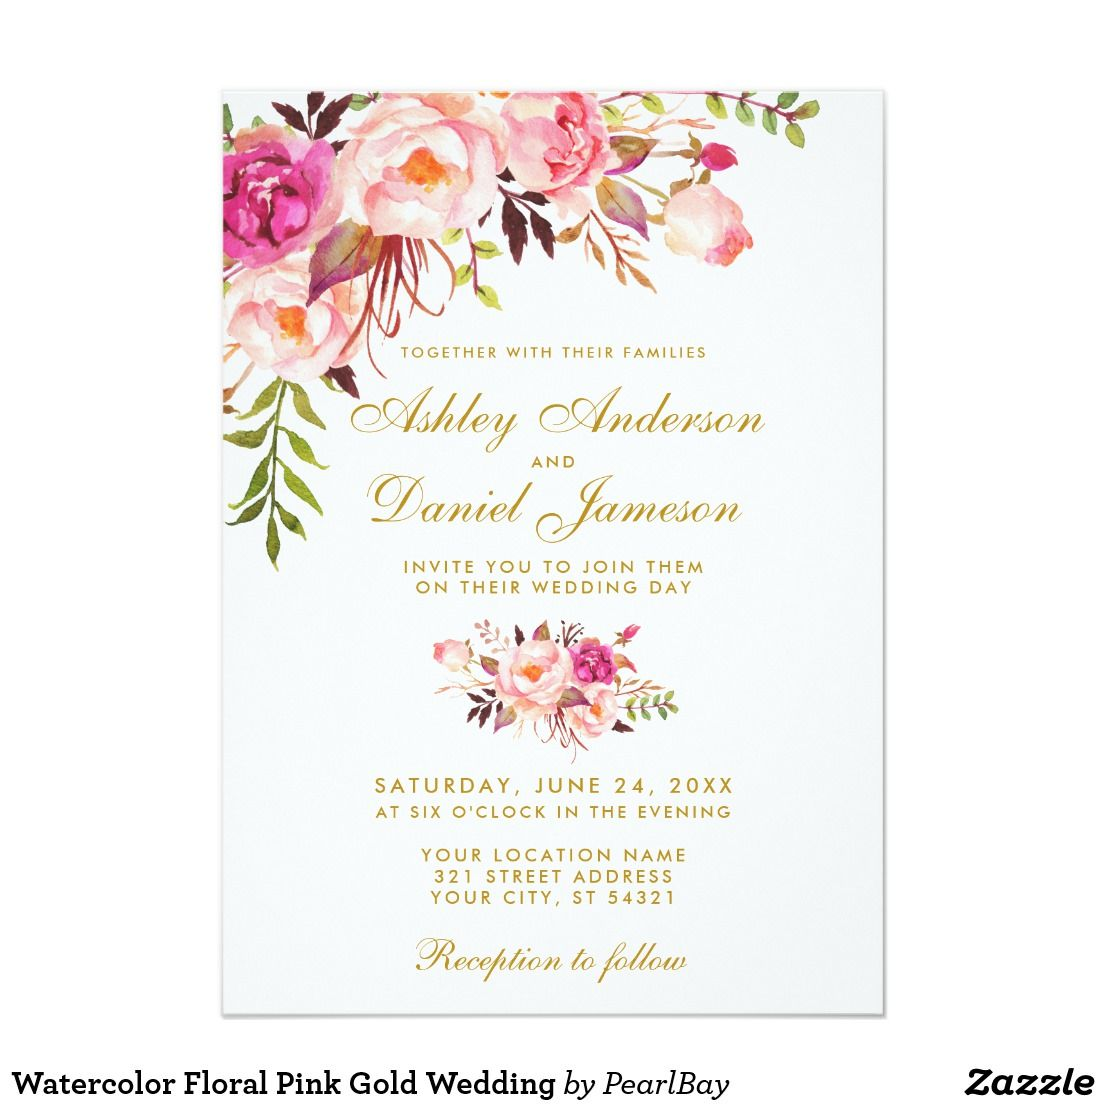 Watercolor Floral Pink Gold Wedding Invitation Zazzle Com